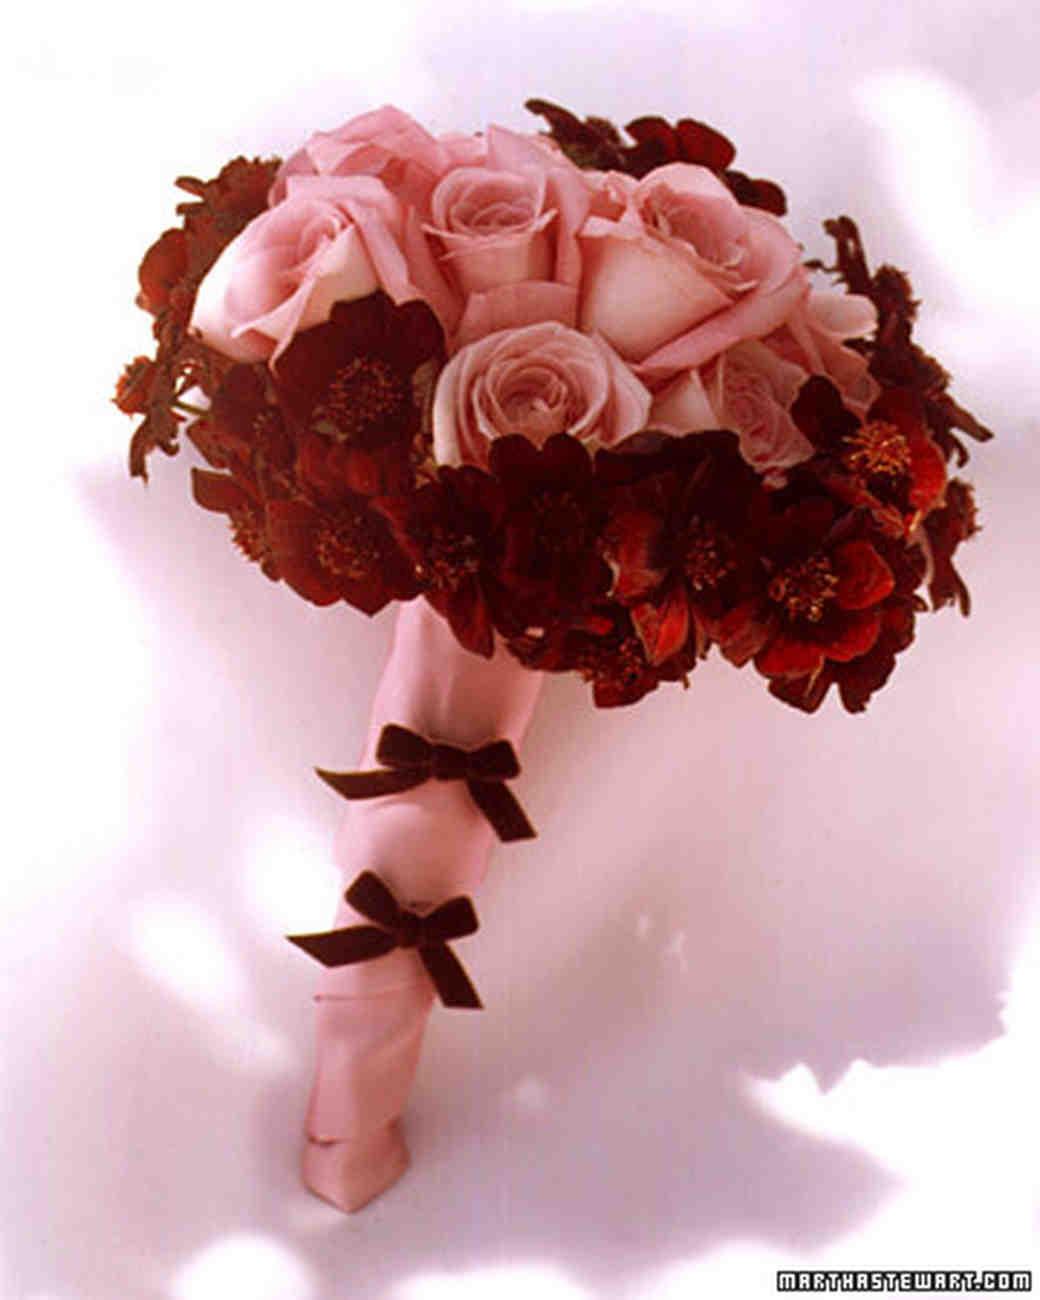 Empty Vase Florist Los Angeles Ca Of 79 White Wedding Centerpieces Martha Stewart Weddings with Red Wedding Flowers